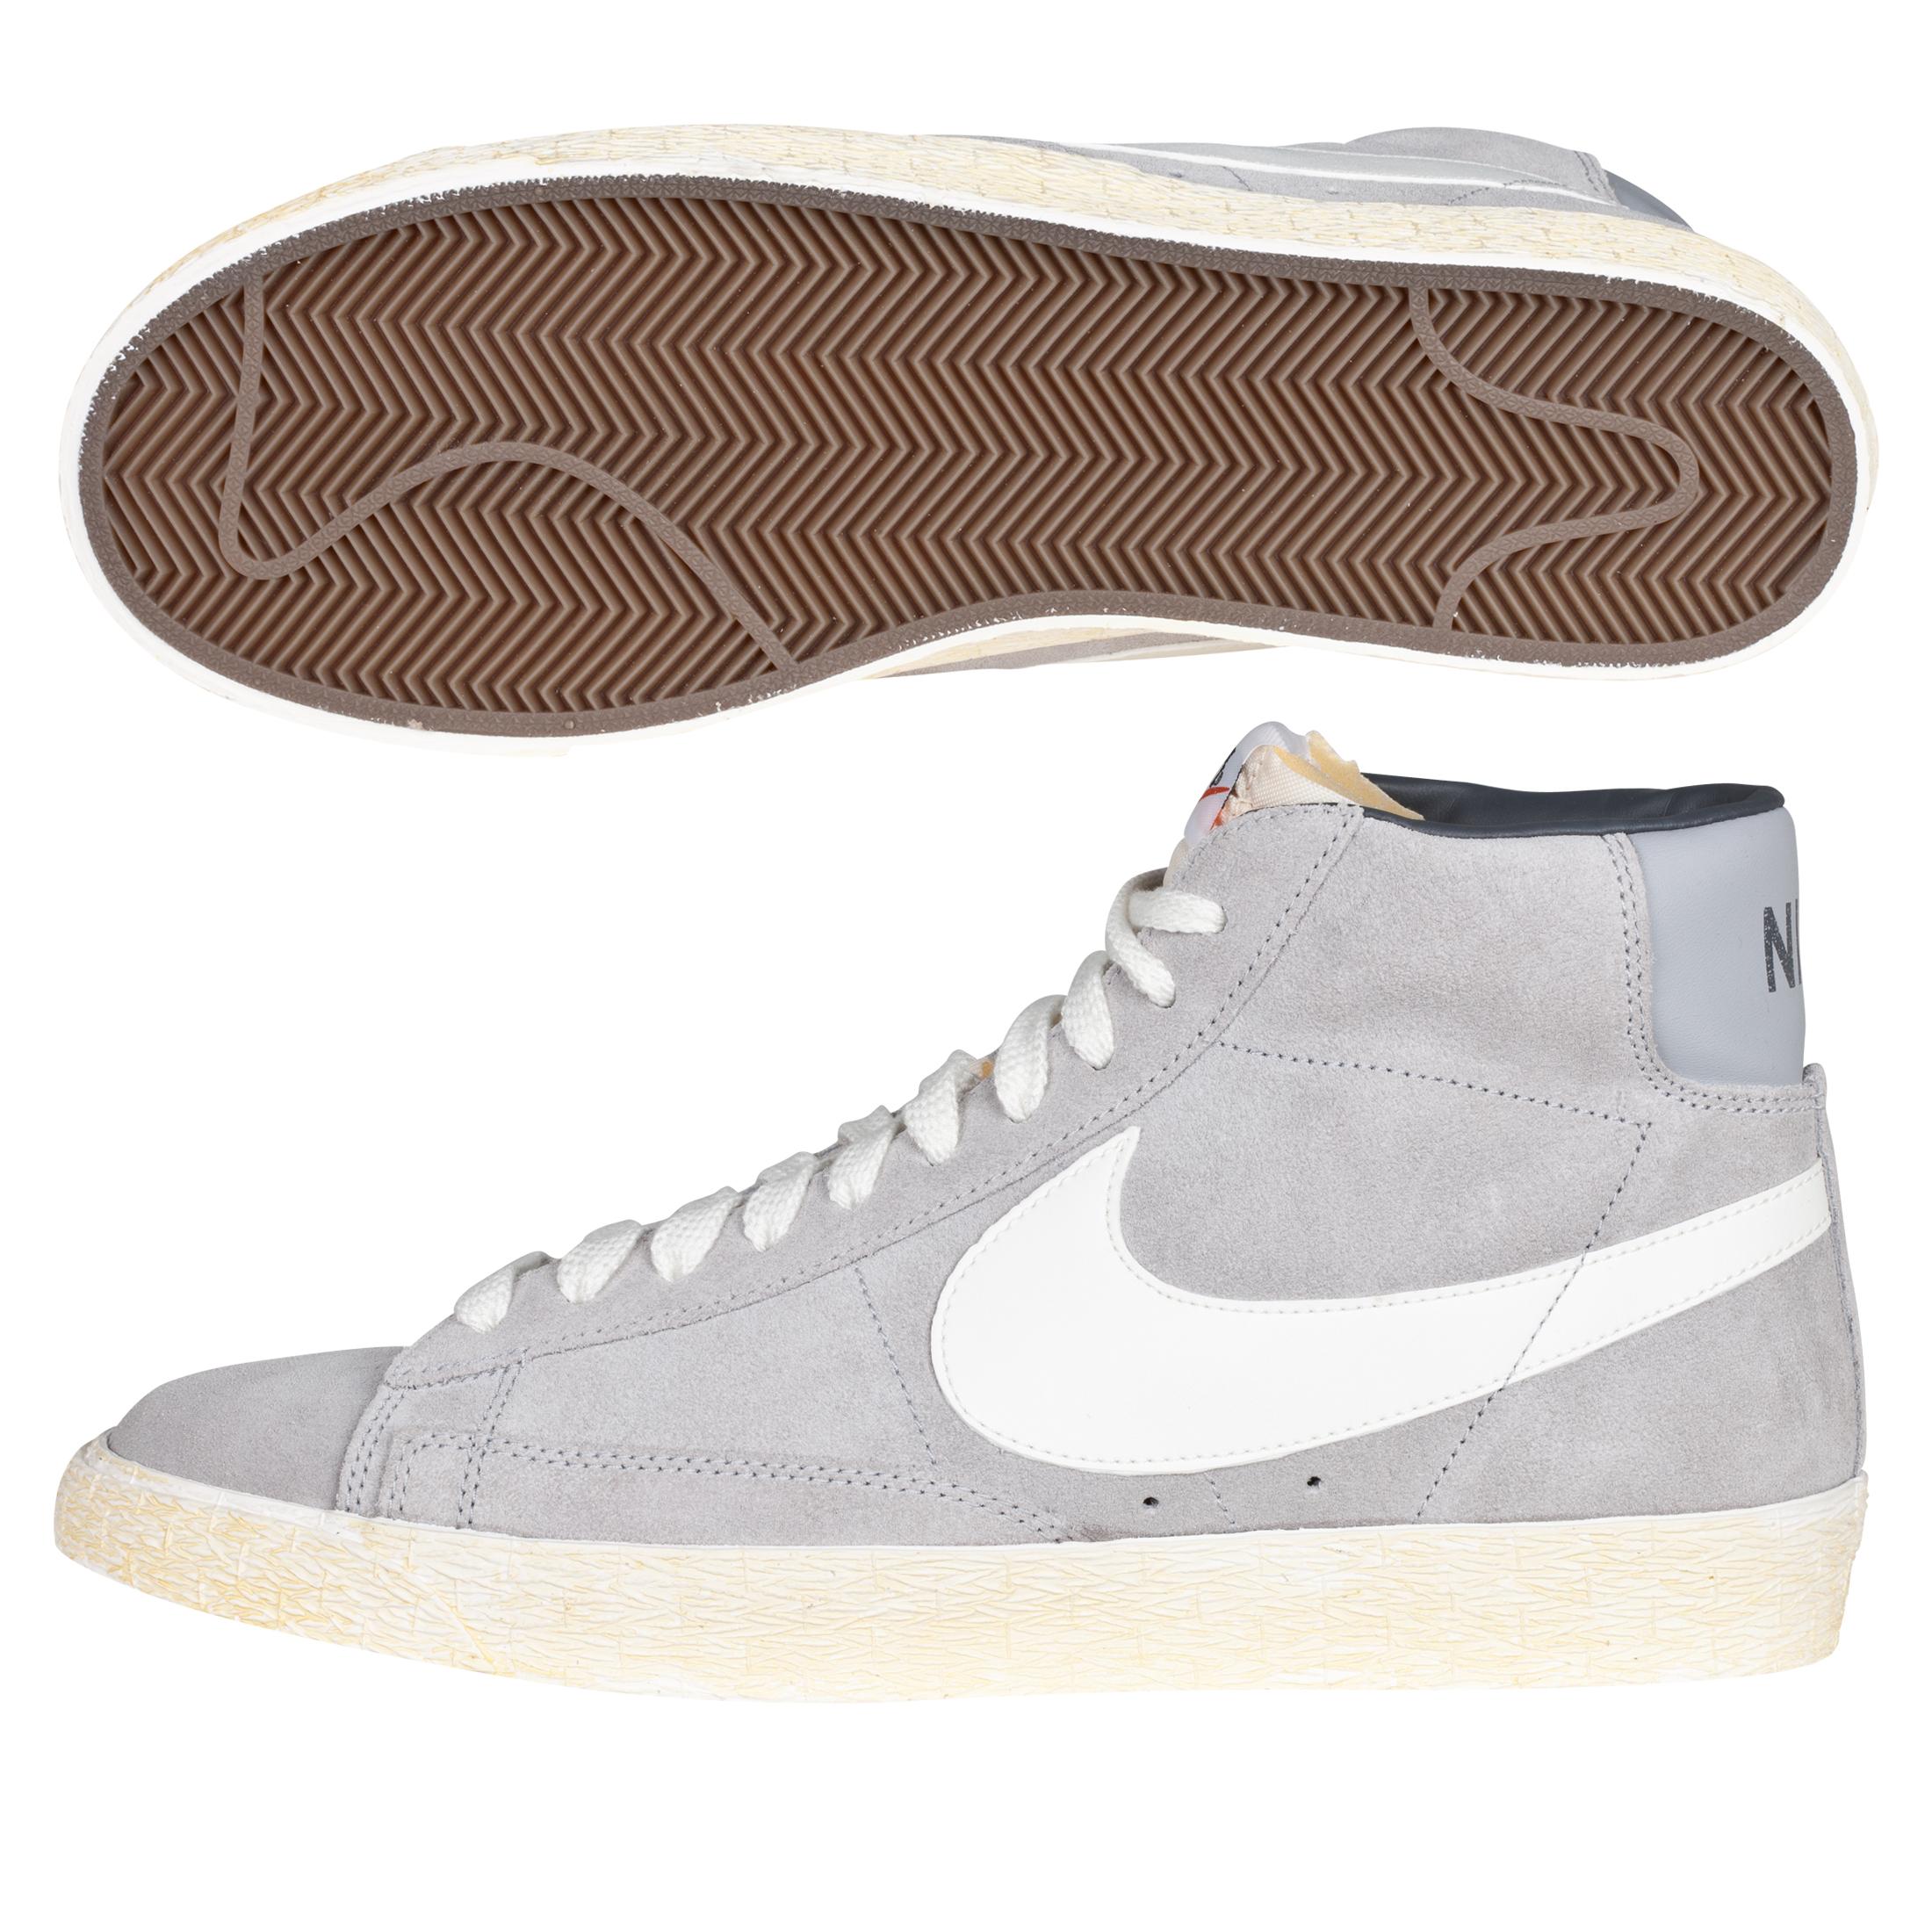 Nike Blazer Mid Vintage Suede Trainers - Medium Grey/Neutral Grey